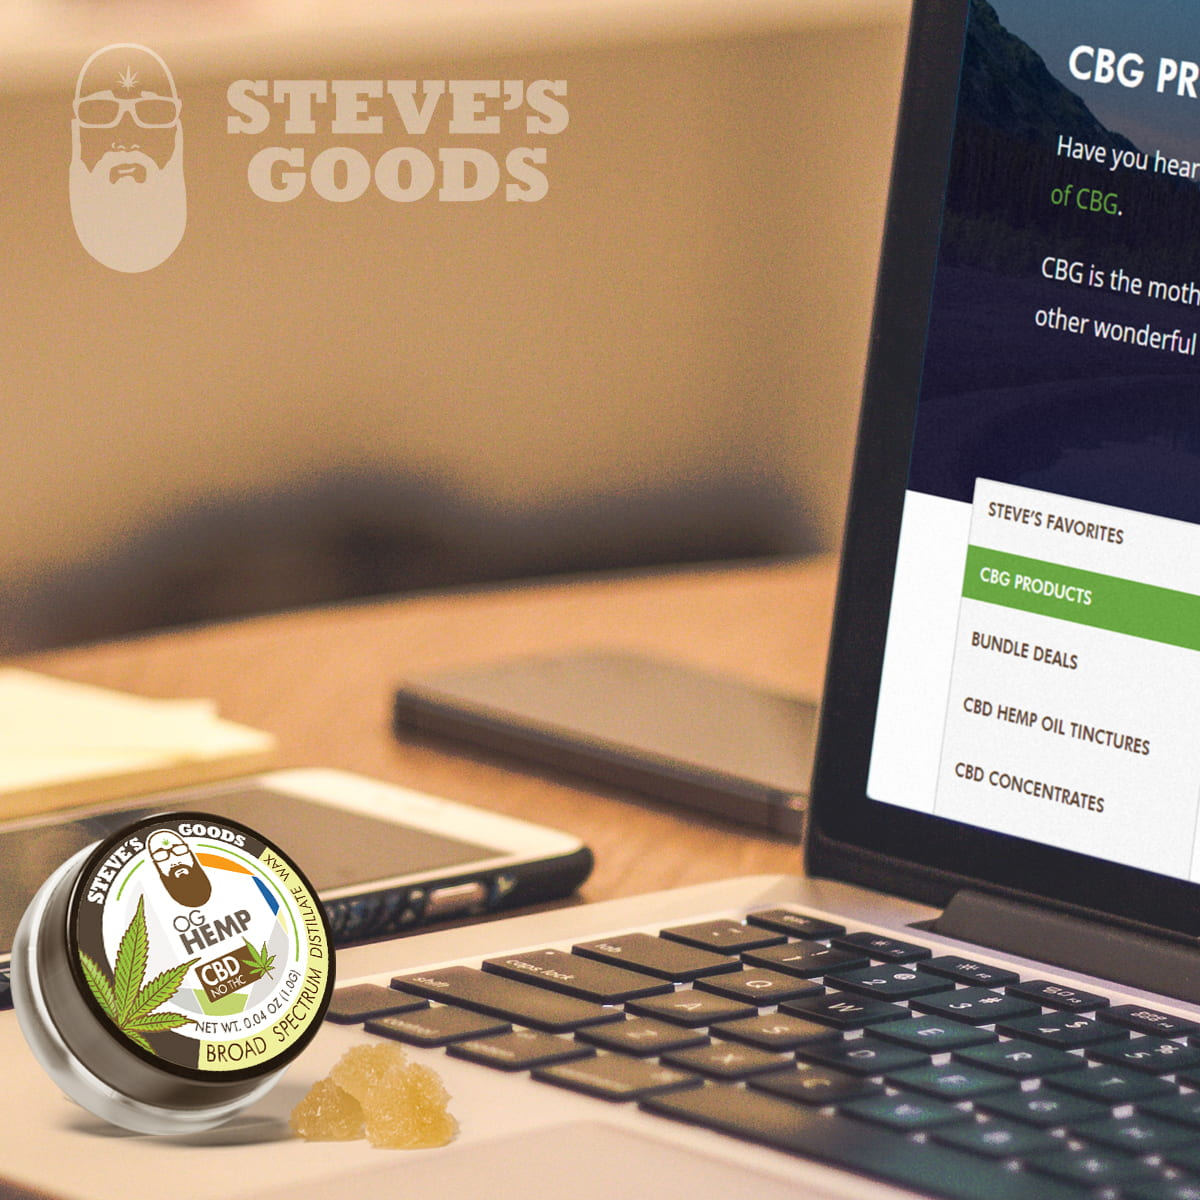 steves-goods-cbd-concentrates-wax-og-hemp